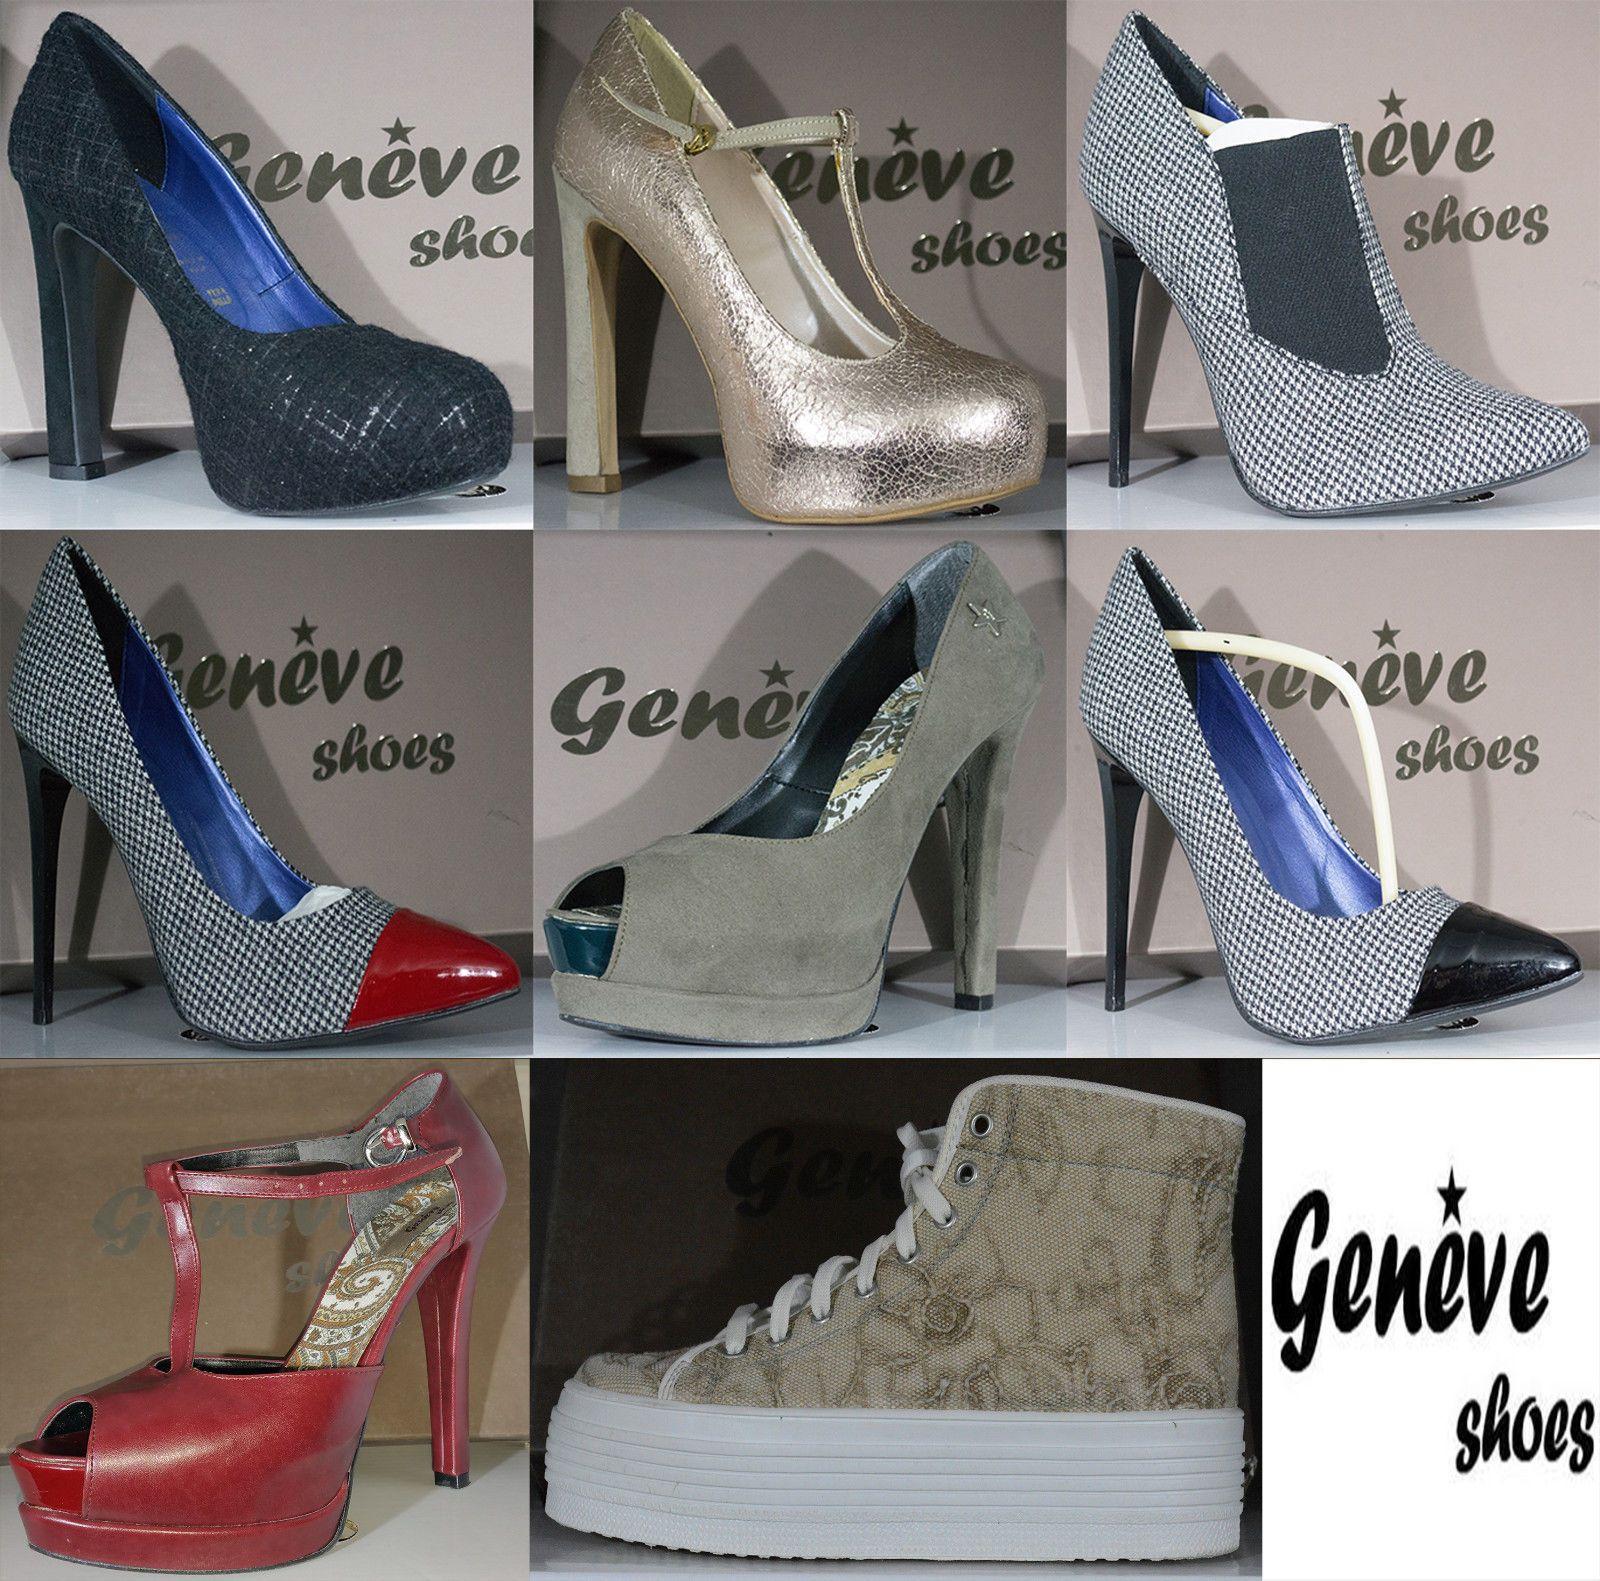 Scarpe Donna Decolletè Zeppa Woman Shoes Anyi Lu MADE ITA Nero Camoscio Schuhe